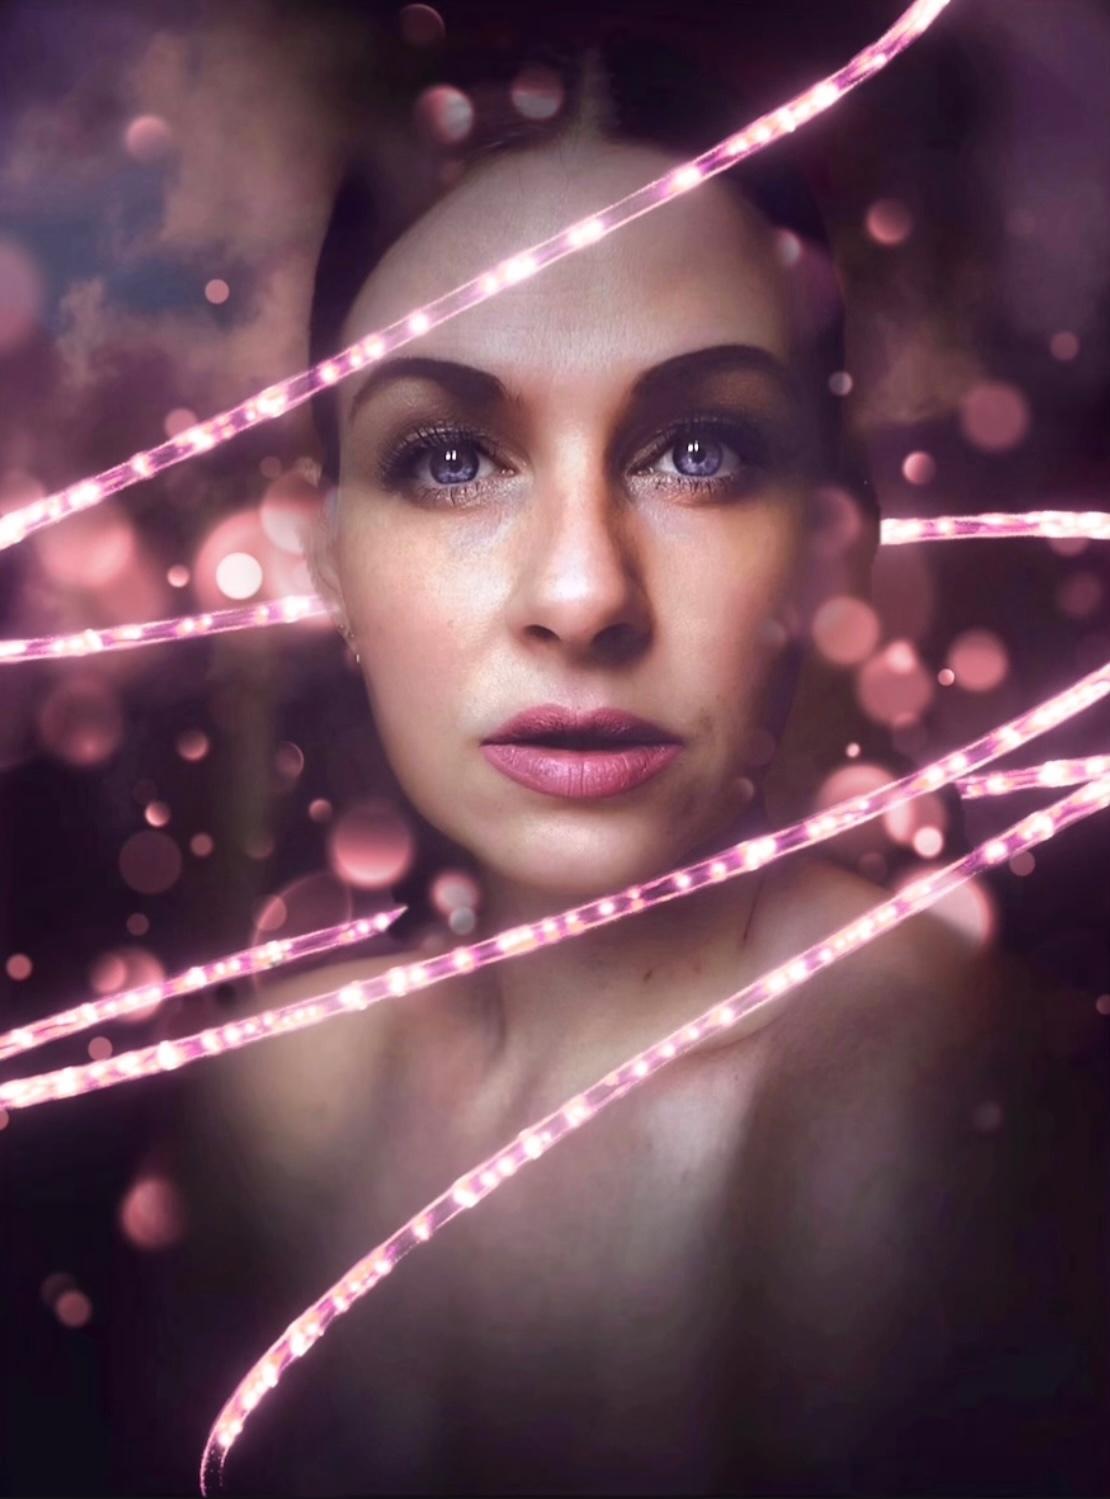 N E O N - .. - foto door Ogenblikfoto op 15-04-2021 - deze foto bevat: neon, fineart, portret, vrouw, ogen, selfie, zelfportret, paars, wolken, lippen, lippenstift, roze, lip, wenkbrauw, wimper, purper, flitsfotografie, roze, muziek artiest, vermaak, paars, cg-illustraties